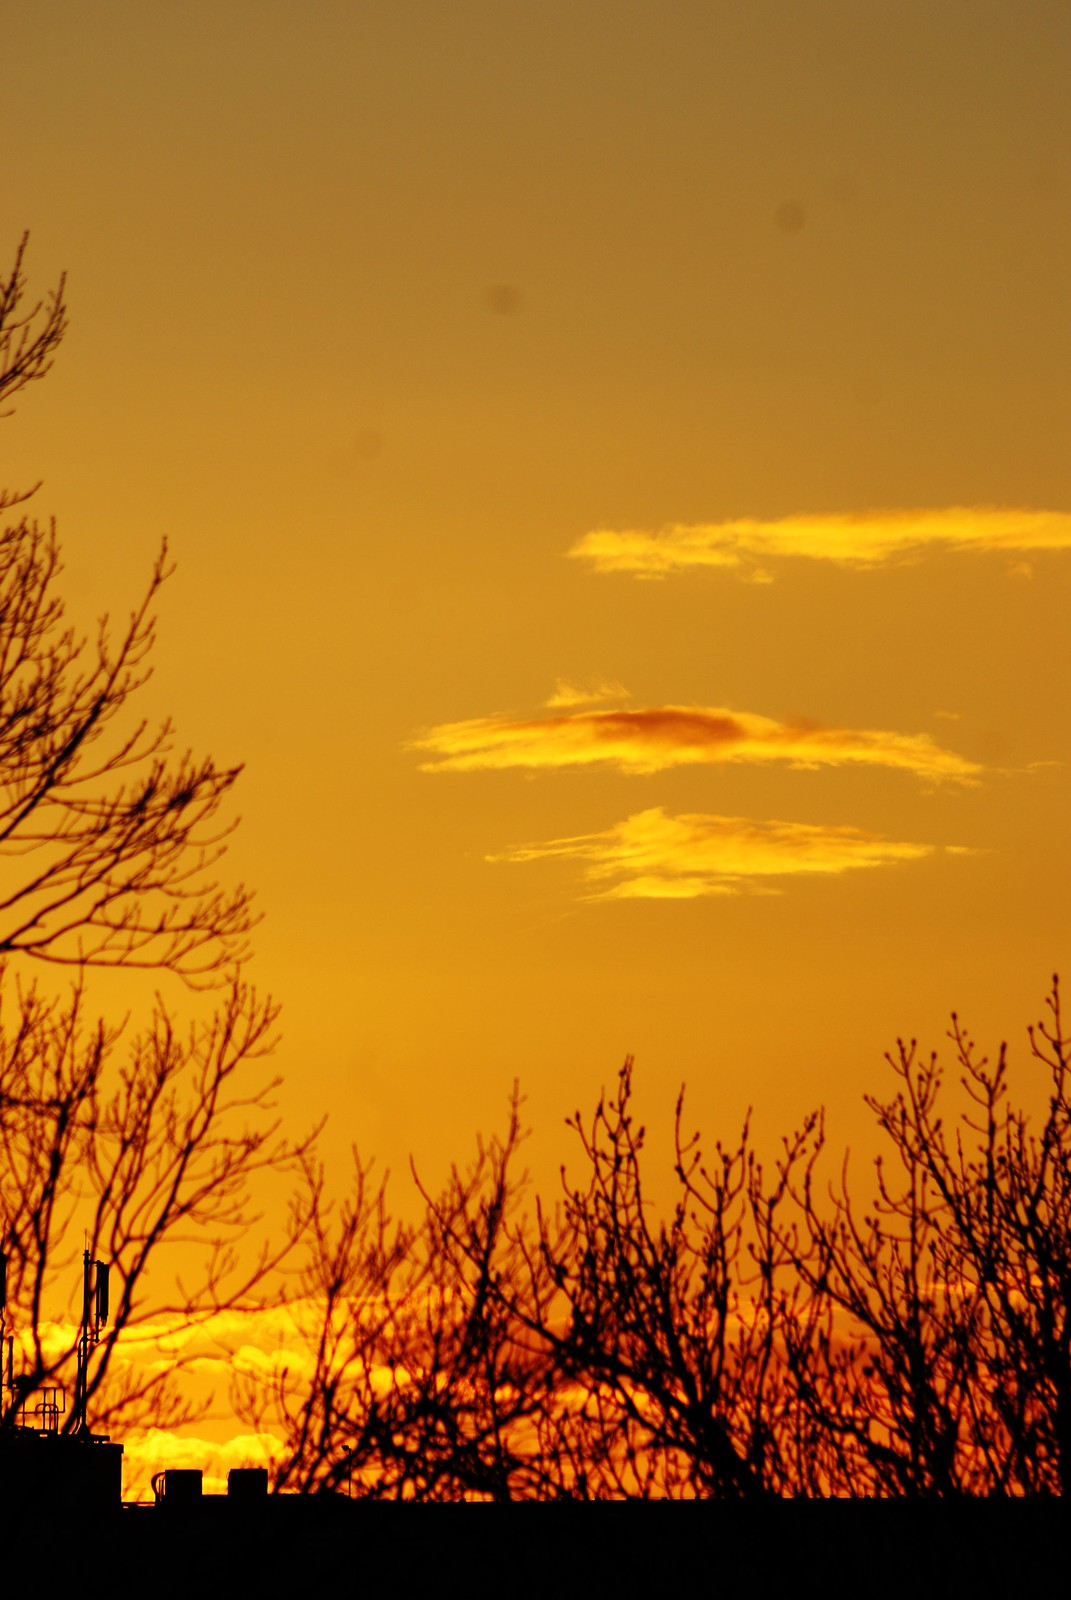 Sonnenuntergang in gelb.